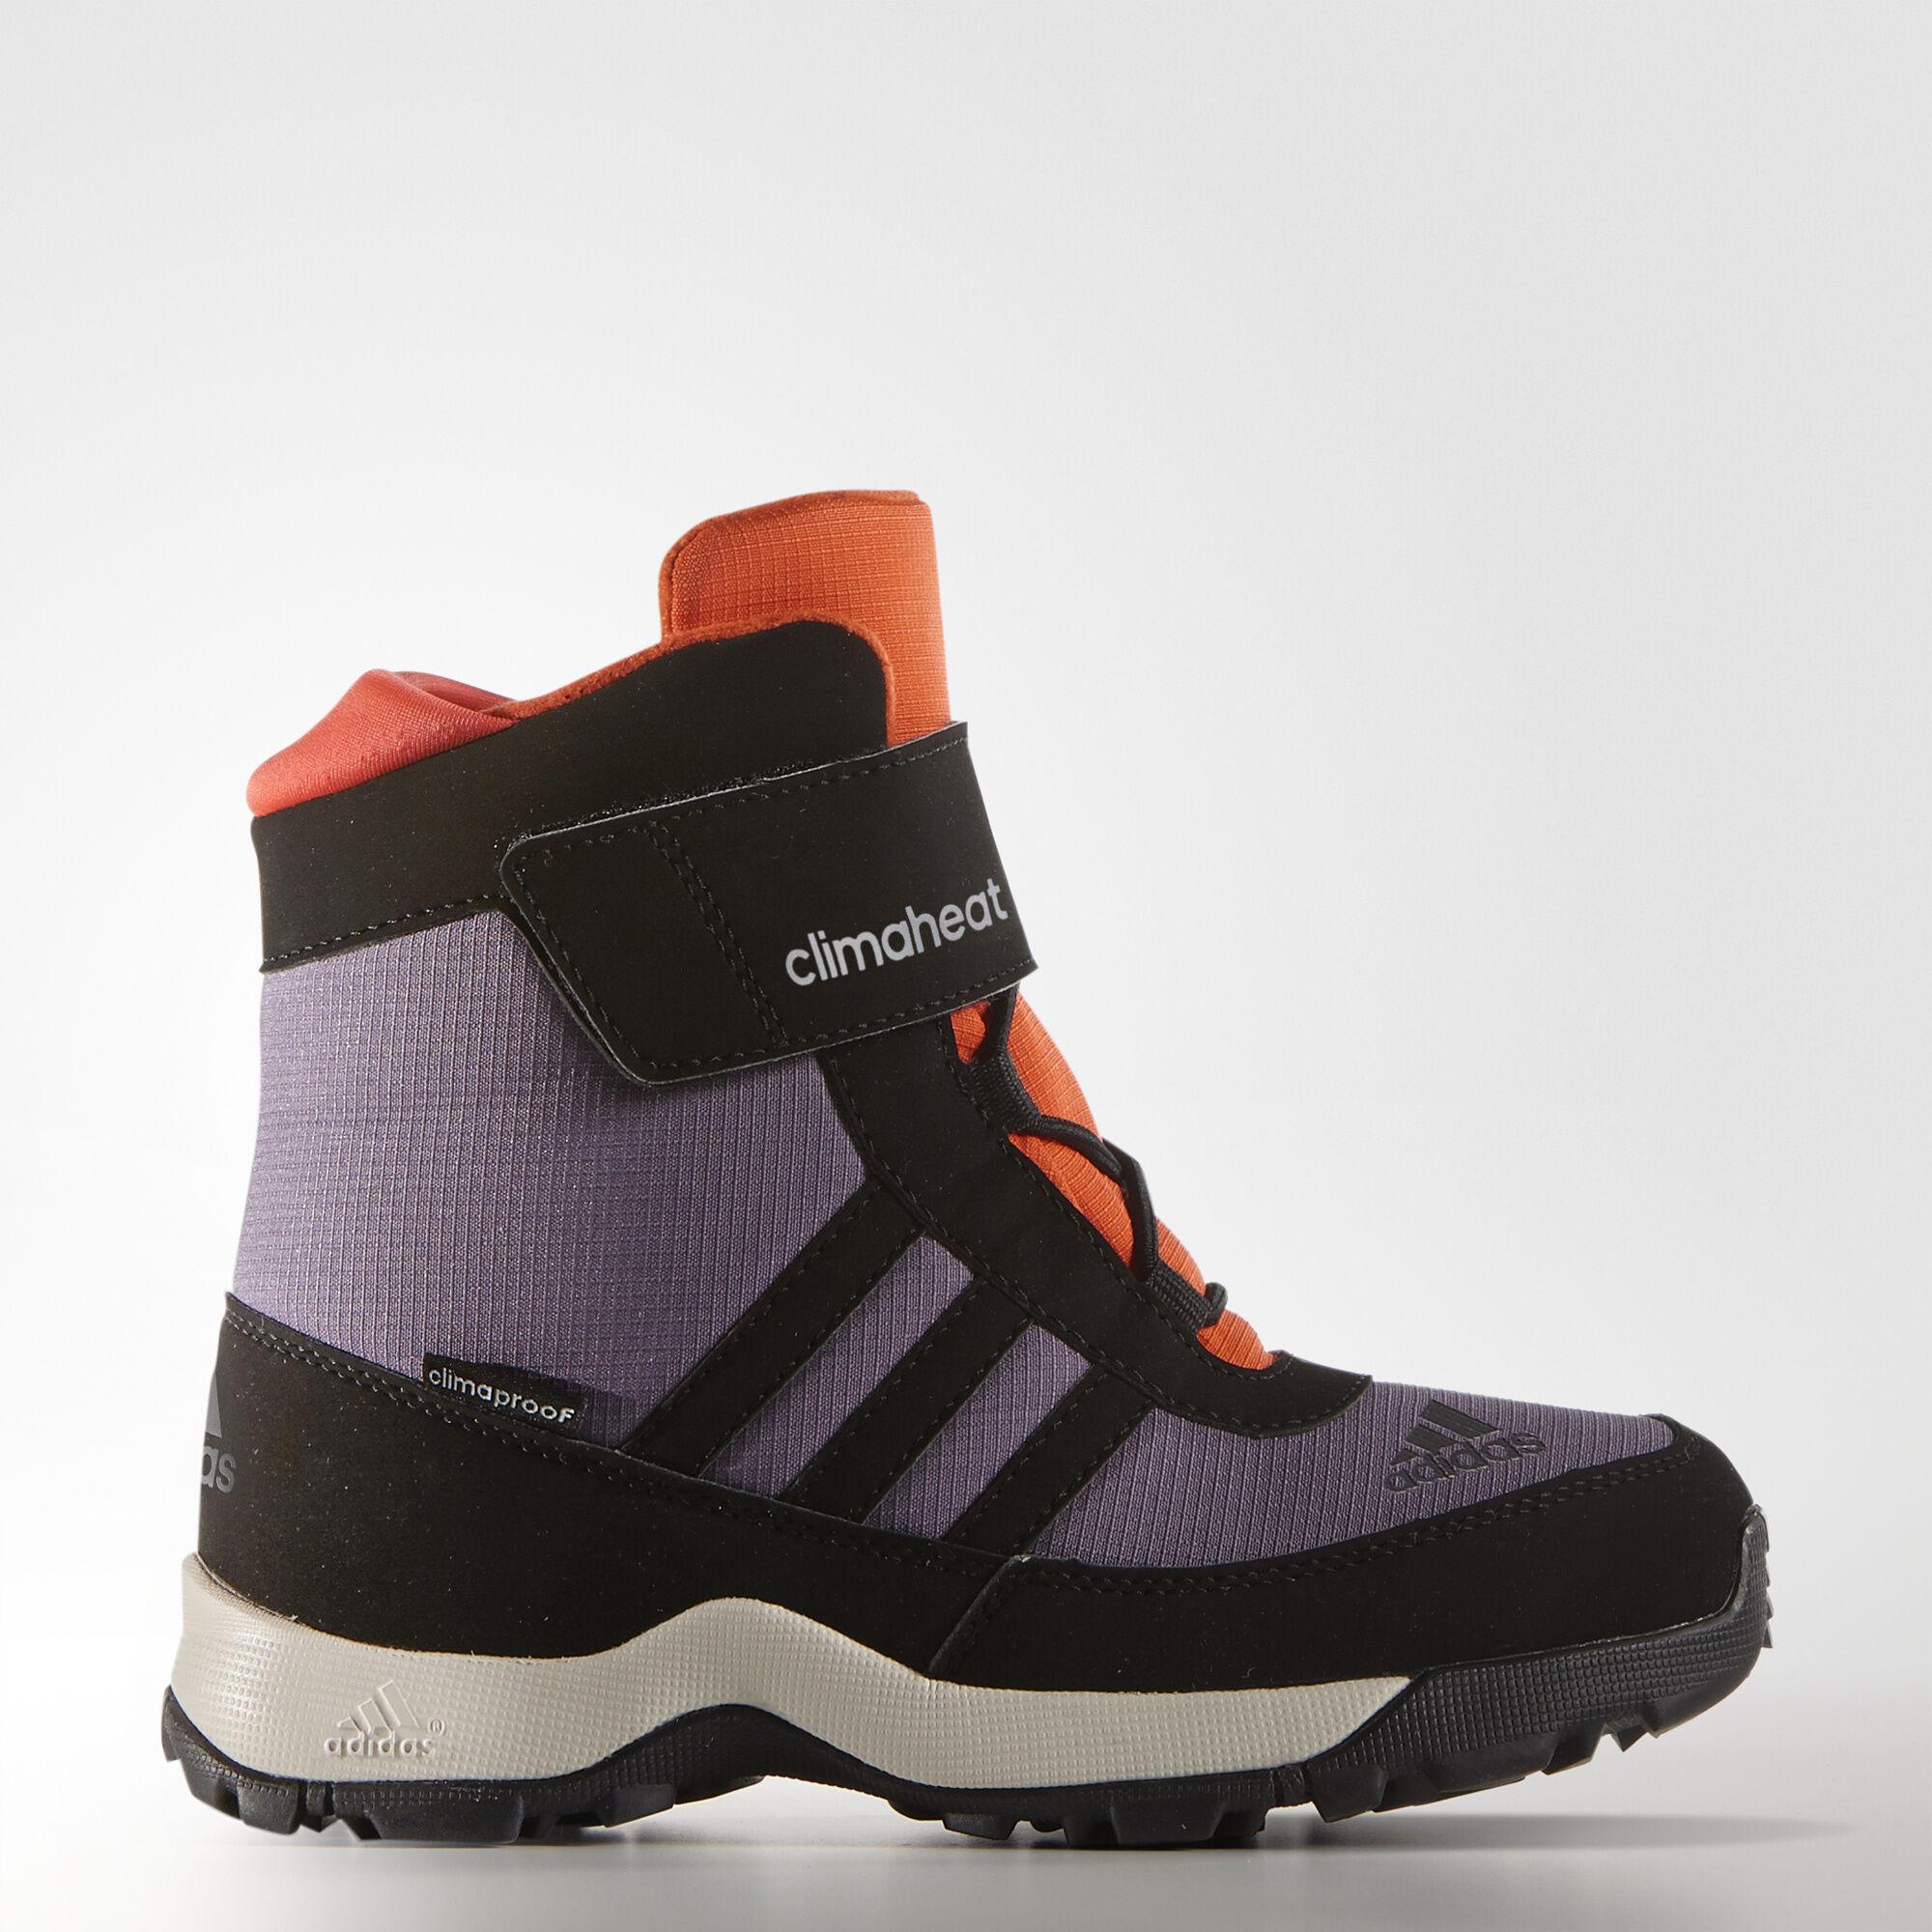 adidas zx 700 winter